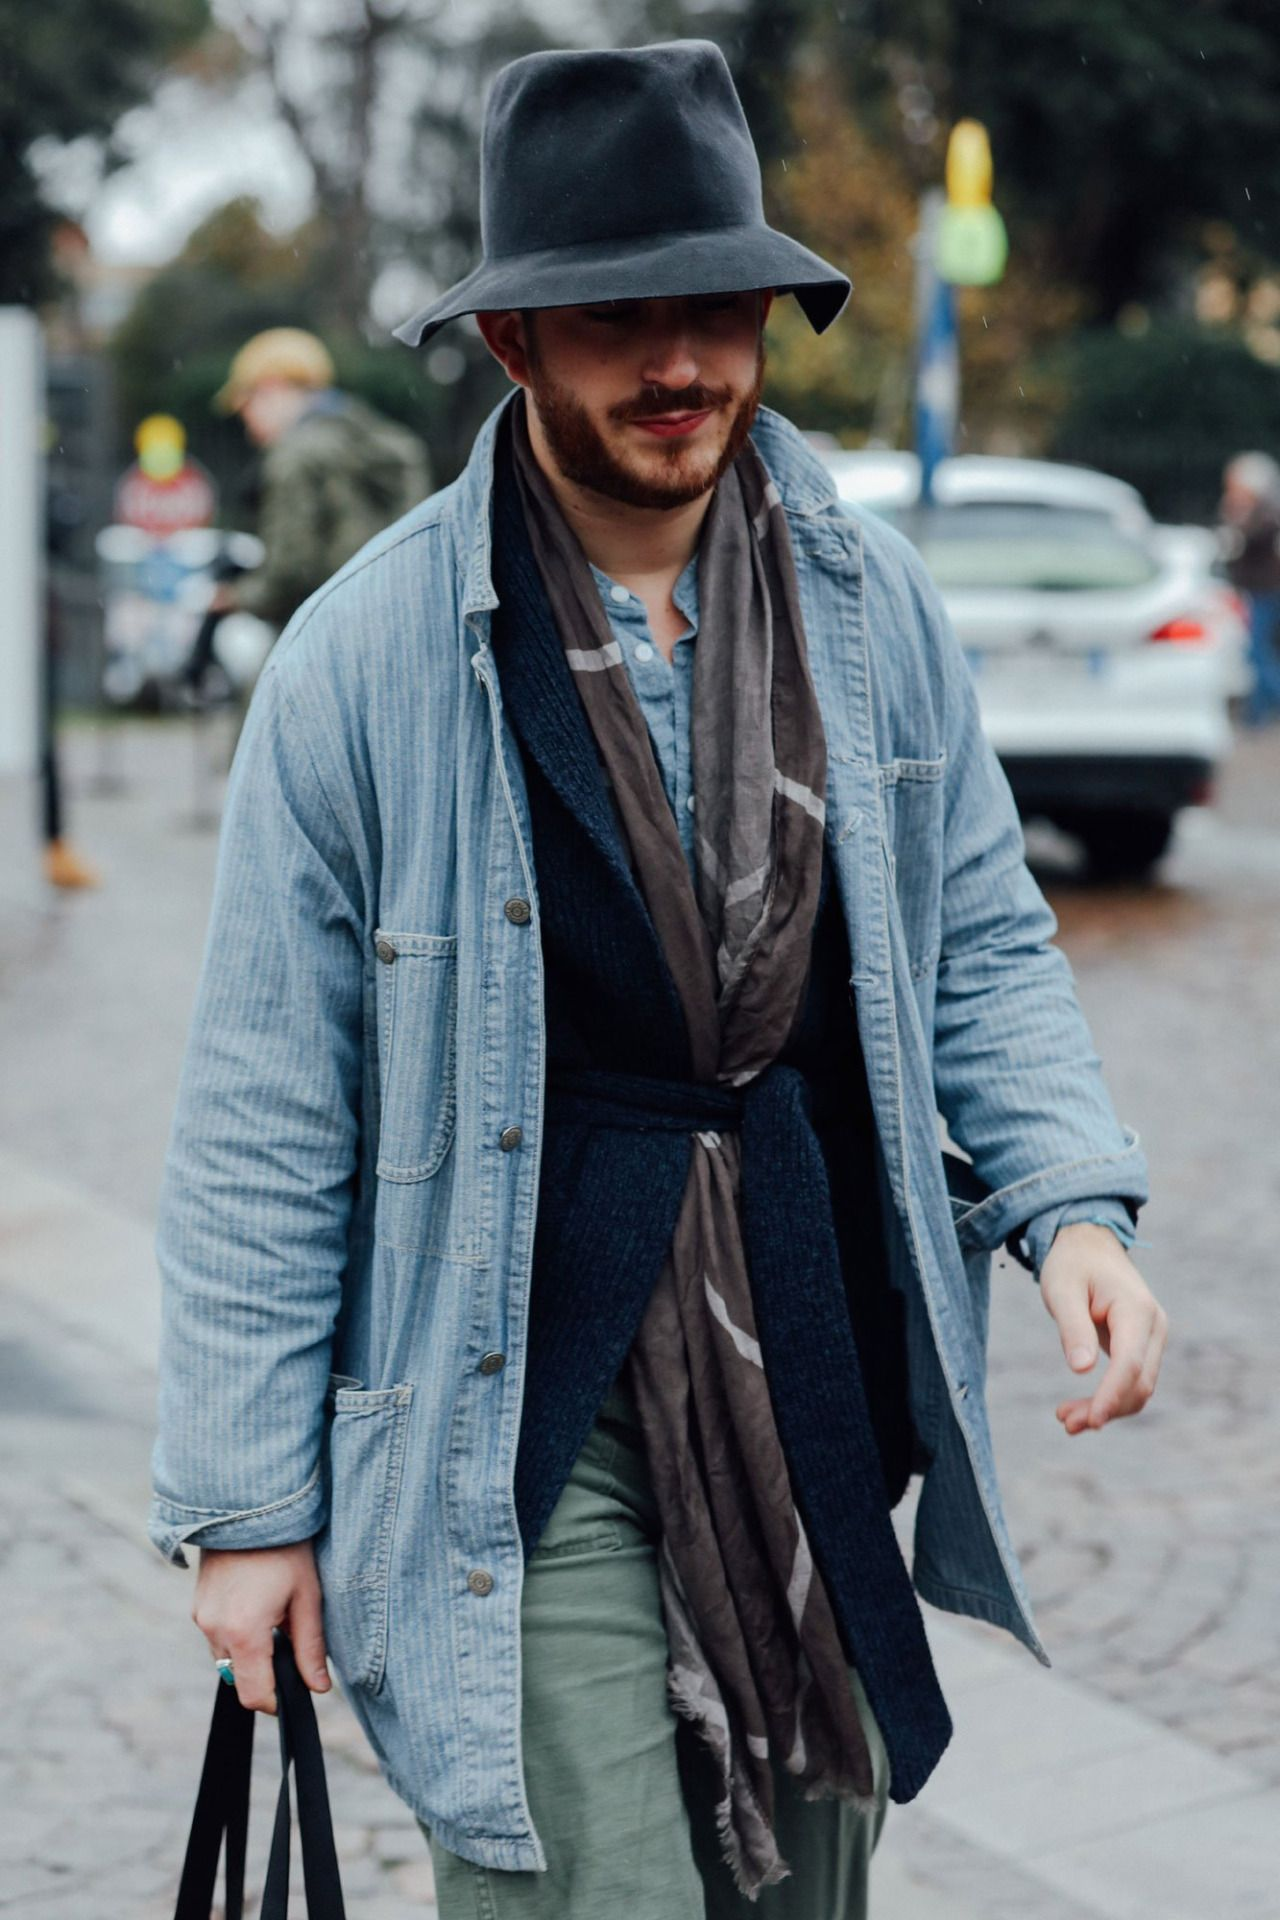 Men Love Fashion Too — iqfashion Christian Kimber Pitti